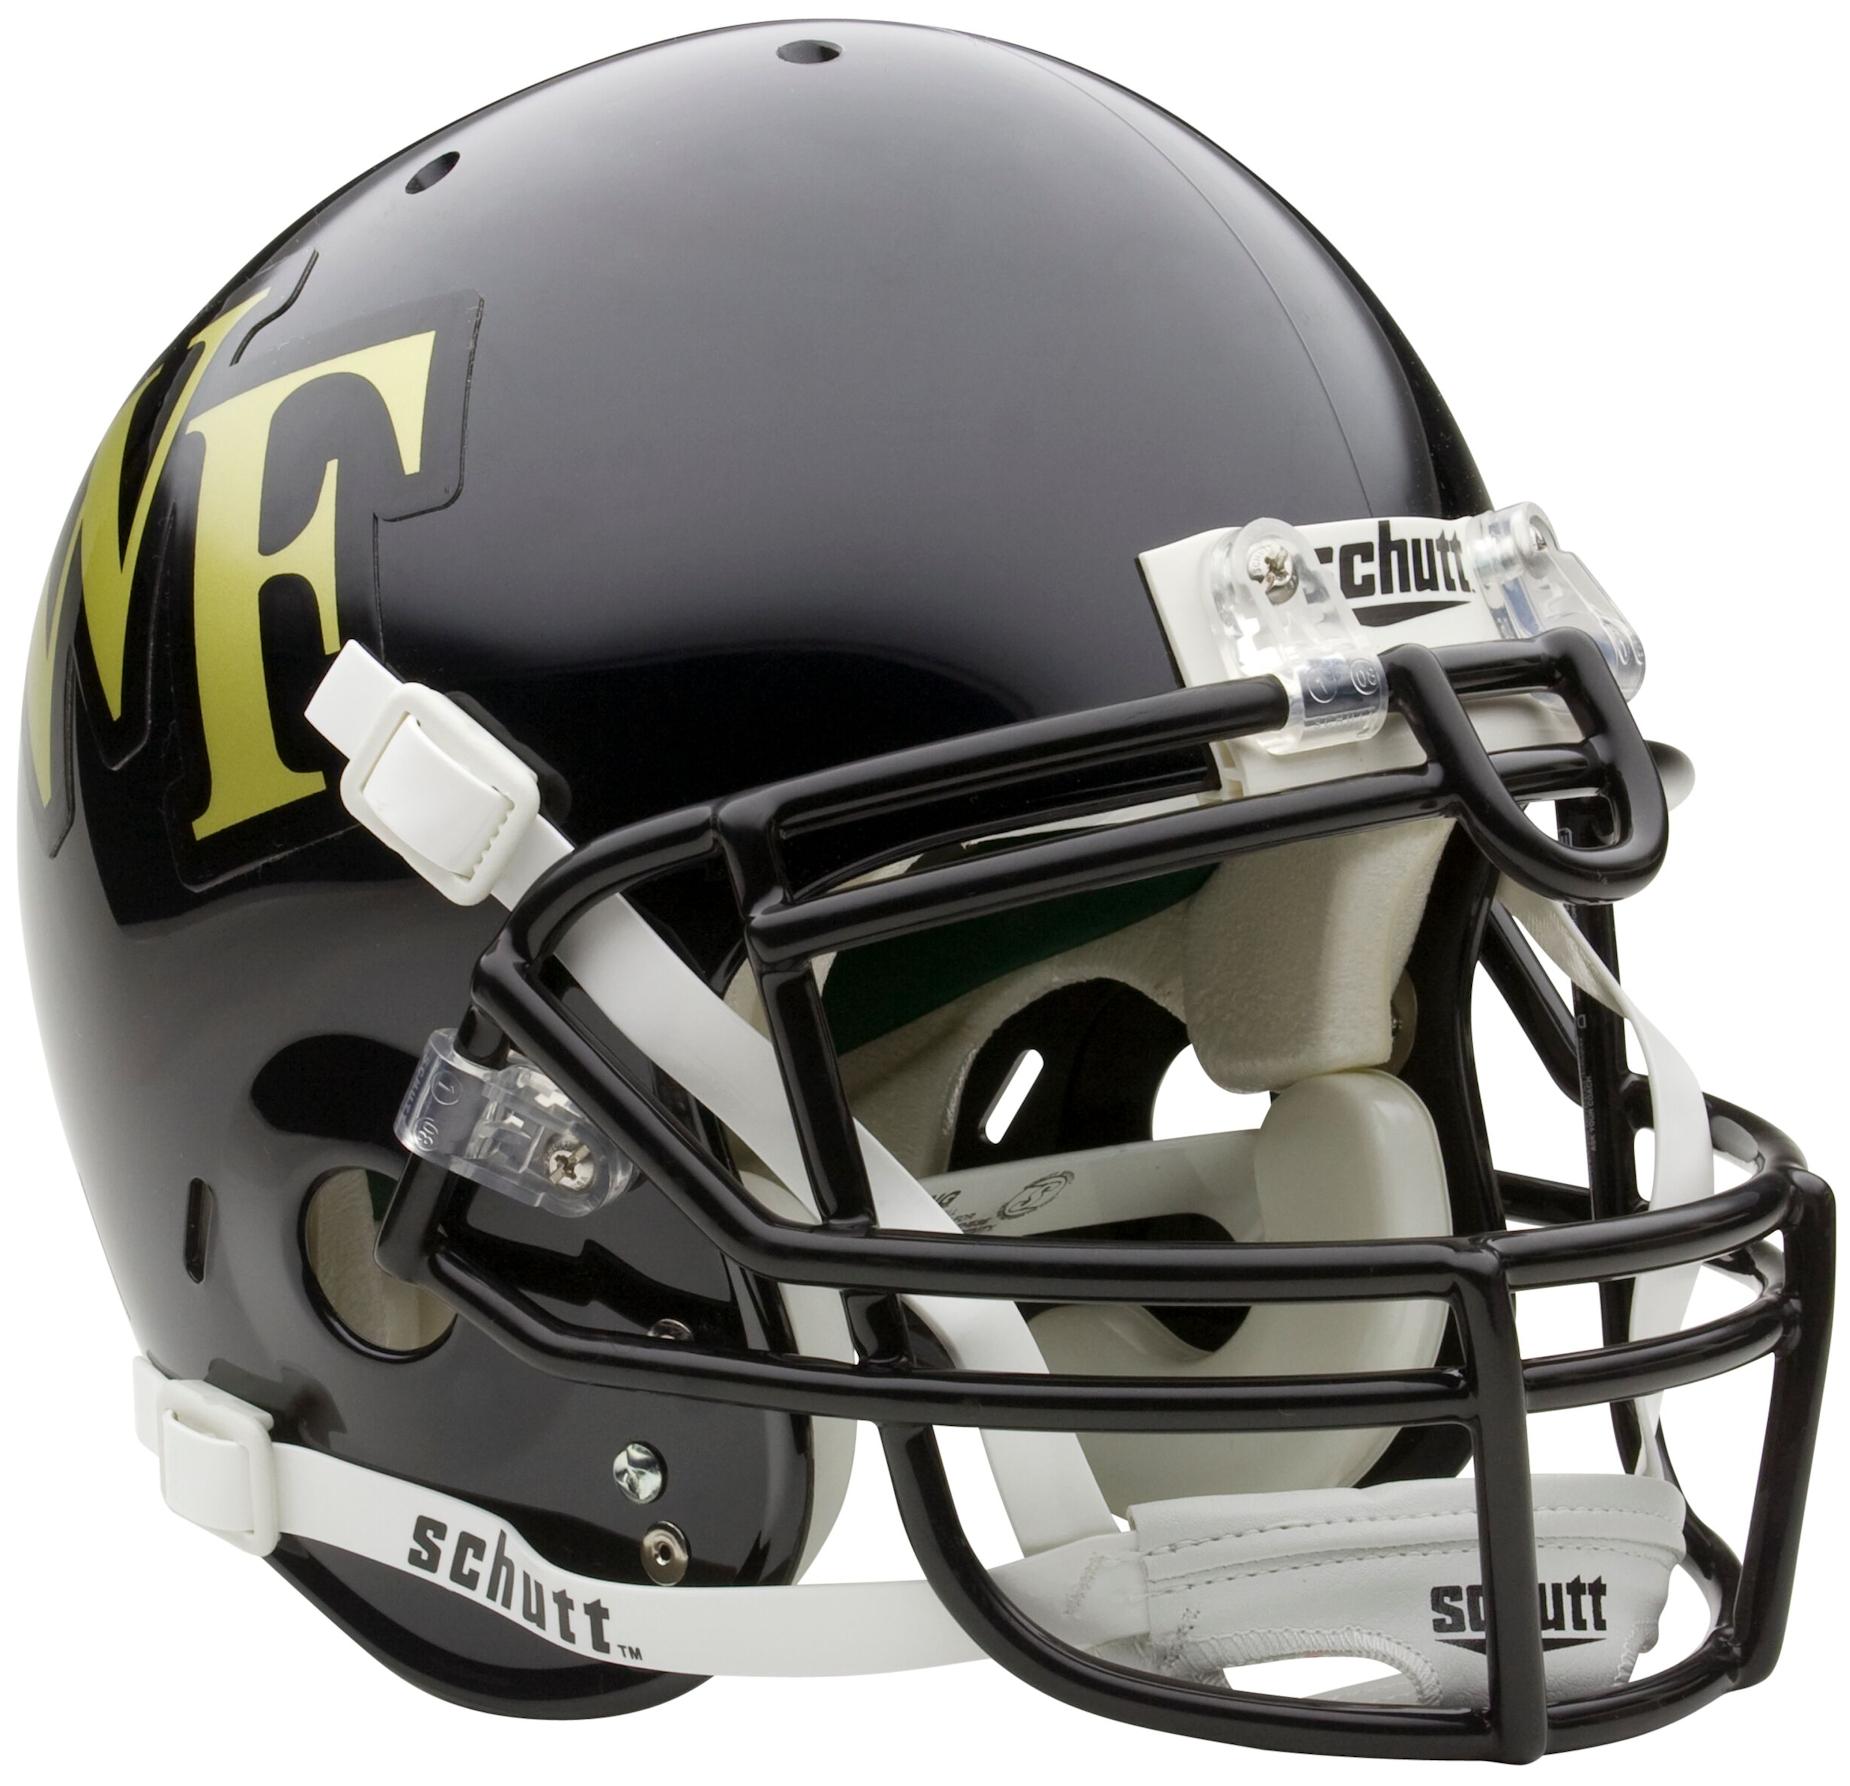 Wake Forest Demon Deacons Authentic College XP Football Helmet Schutt